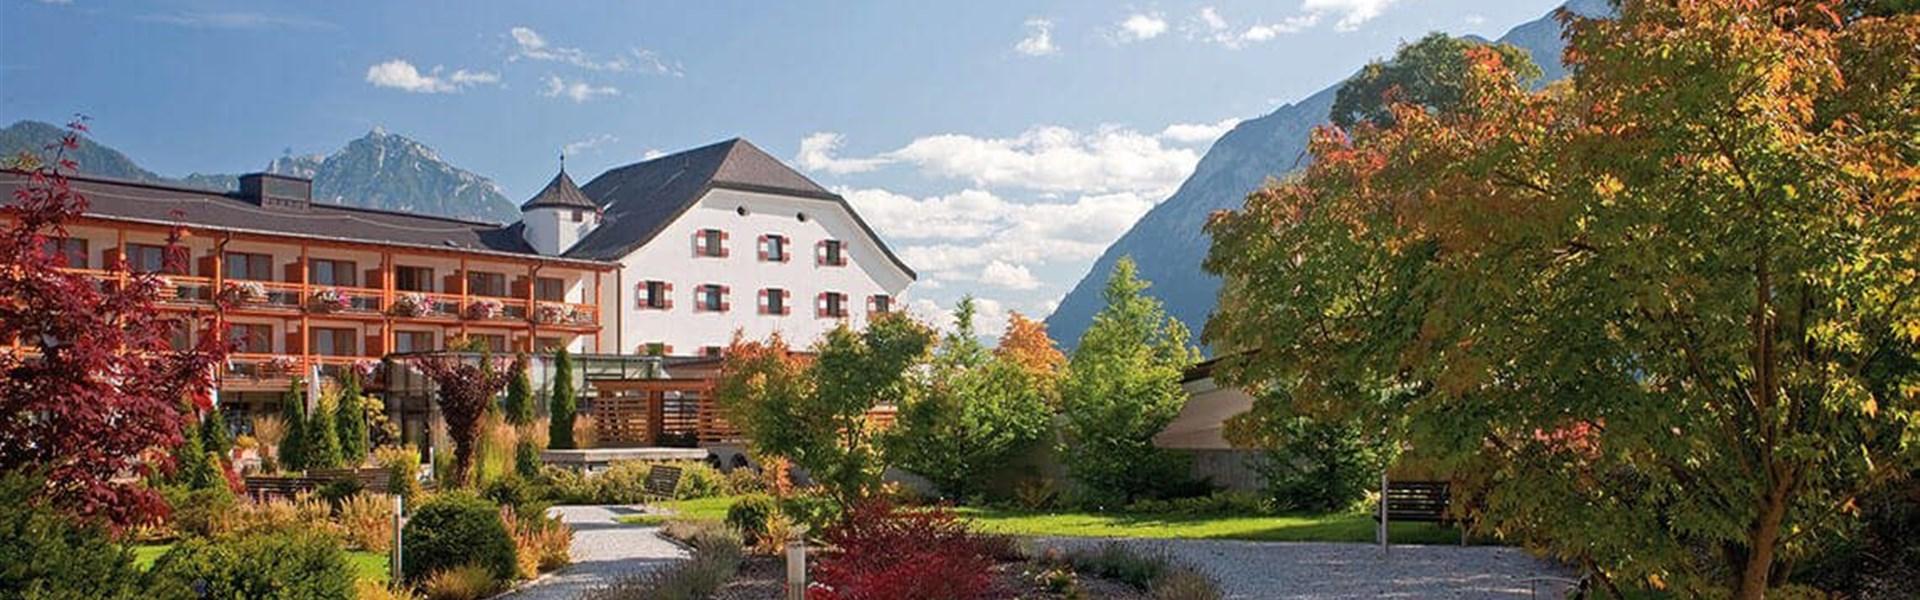 Marco Polo - Fuerstenhaus am Achensee -